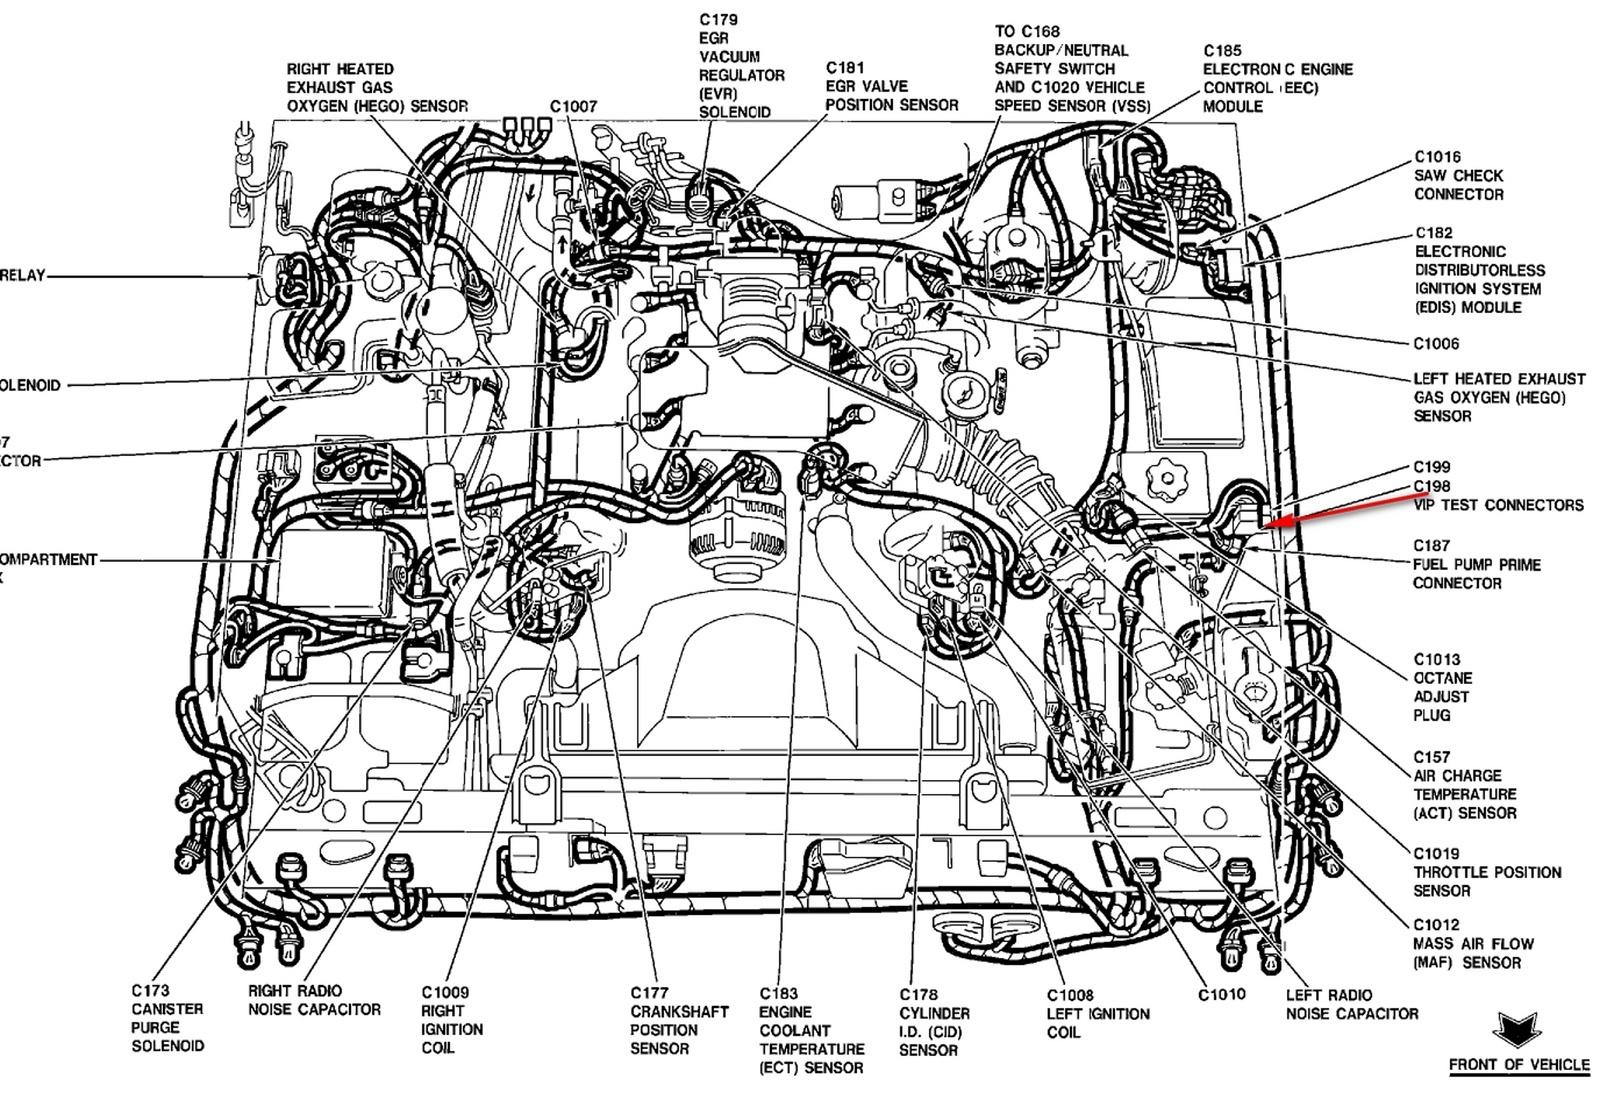 1997 Bmw 318ti Engine Diagram - Jeep Gladiator Fuse Box for Wiring Diagram  Schematics | 1998 Bmw 318ti Engine Diagram |  | Wiring Diagram Schematics